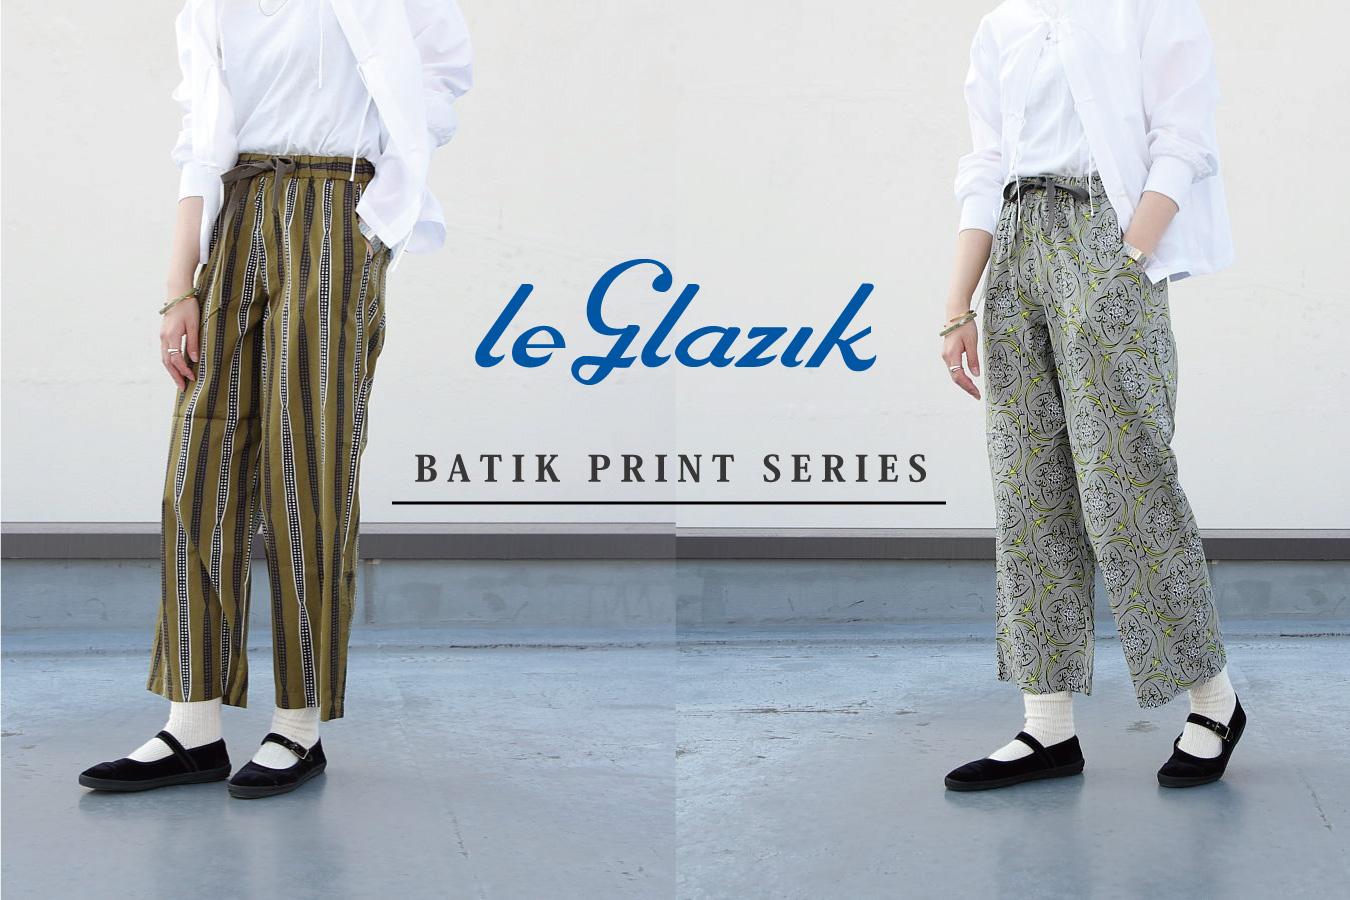 【LE GLAZIK】魅力的なバティック風プリントシリーズ